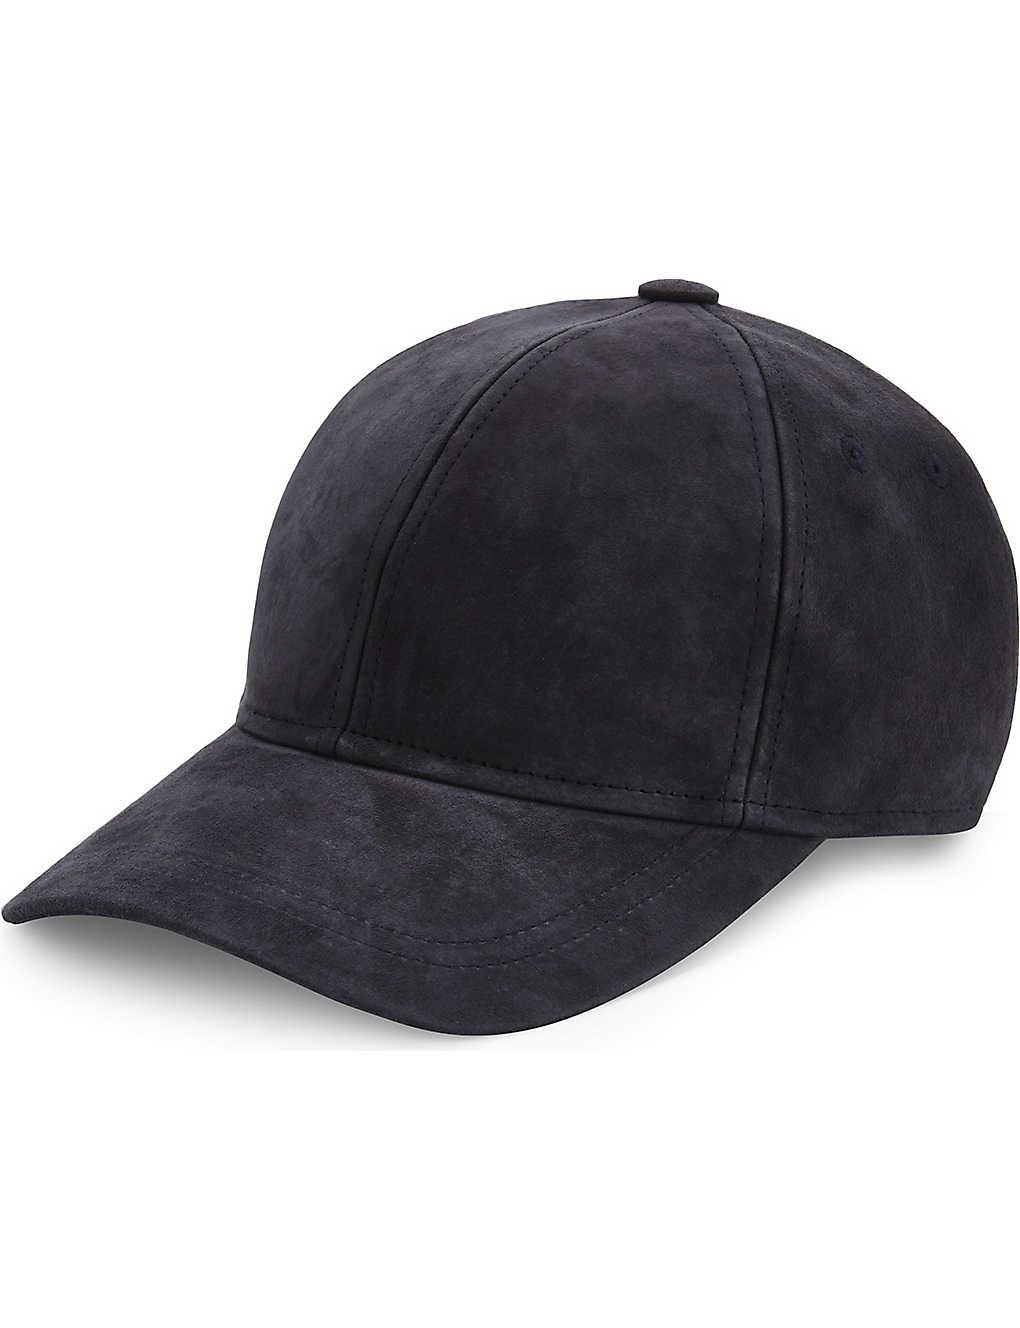 ace2ec842ec TED BAKER - Sospeny suede baseball cap